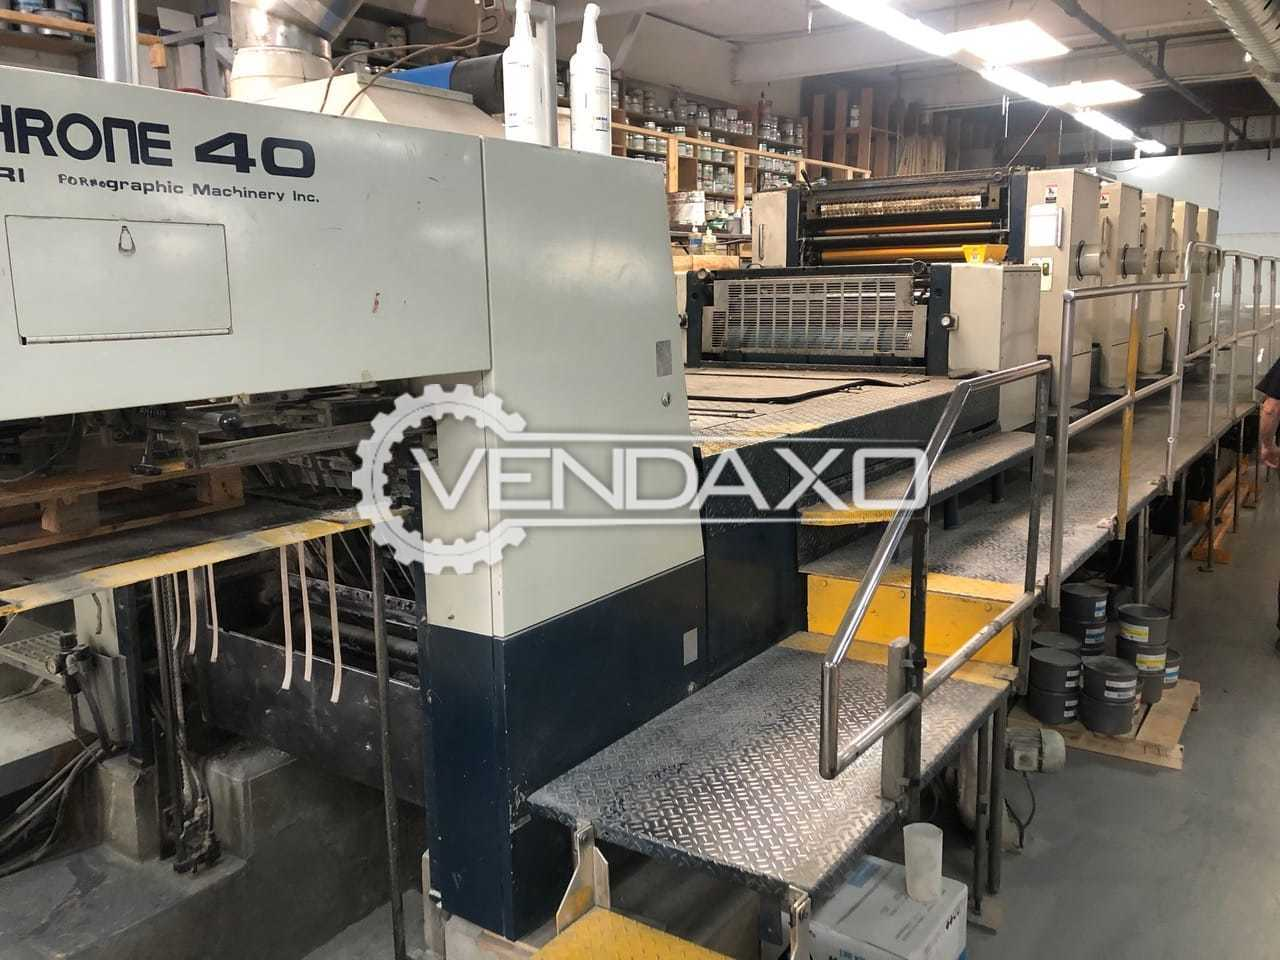 Komori Lithrone 540 Offset Printing Machine - 28 x 40 Inch, 5 Color